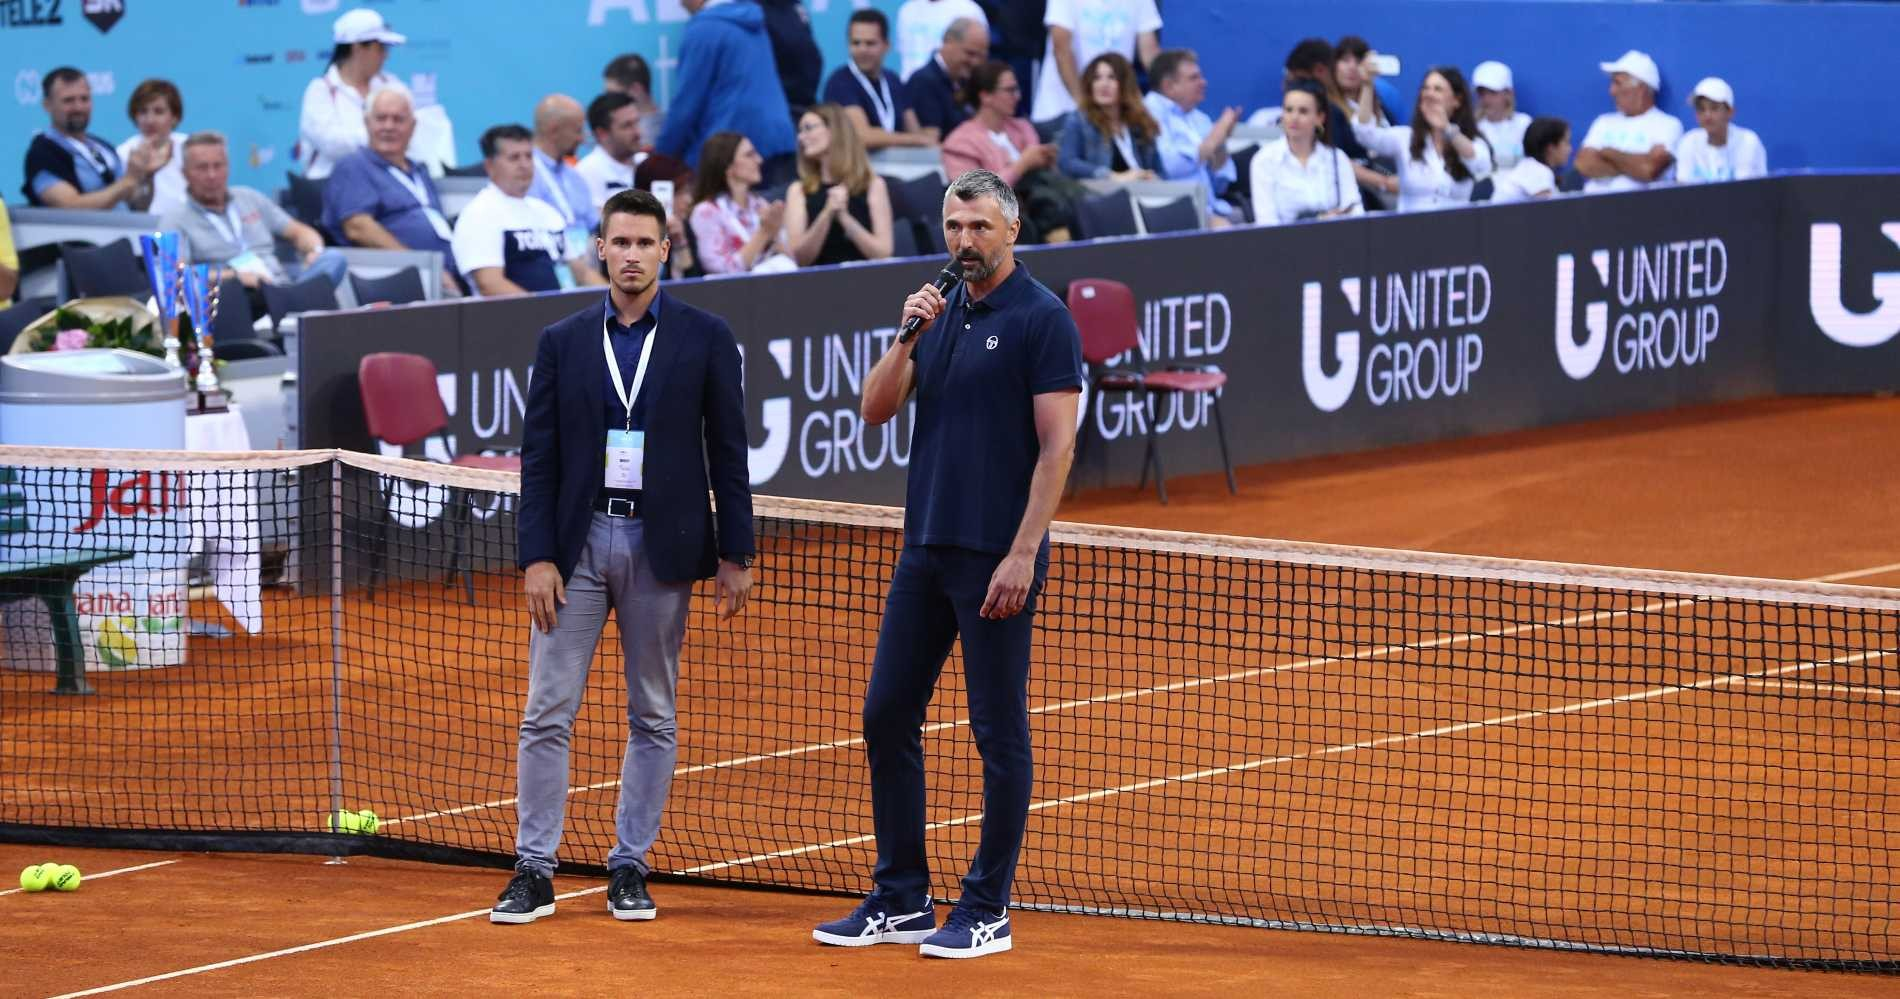 Goran Ivanisevic - Adria Tour